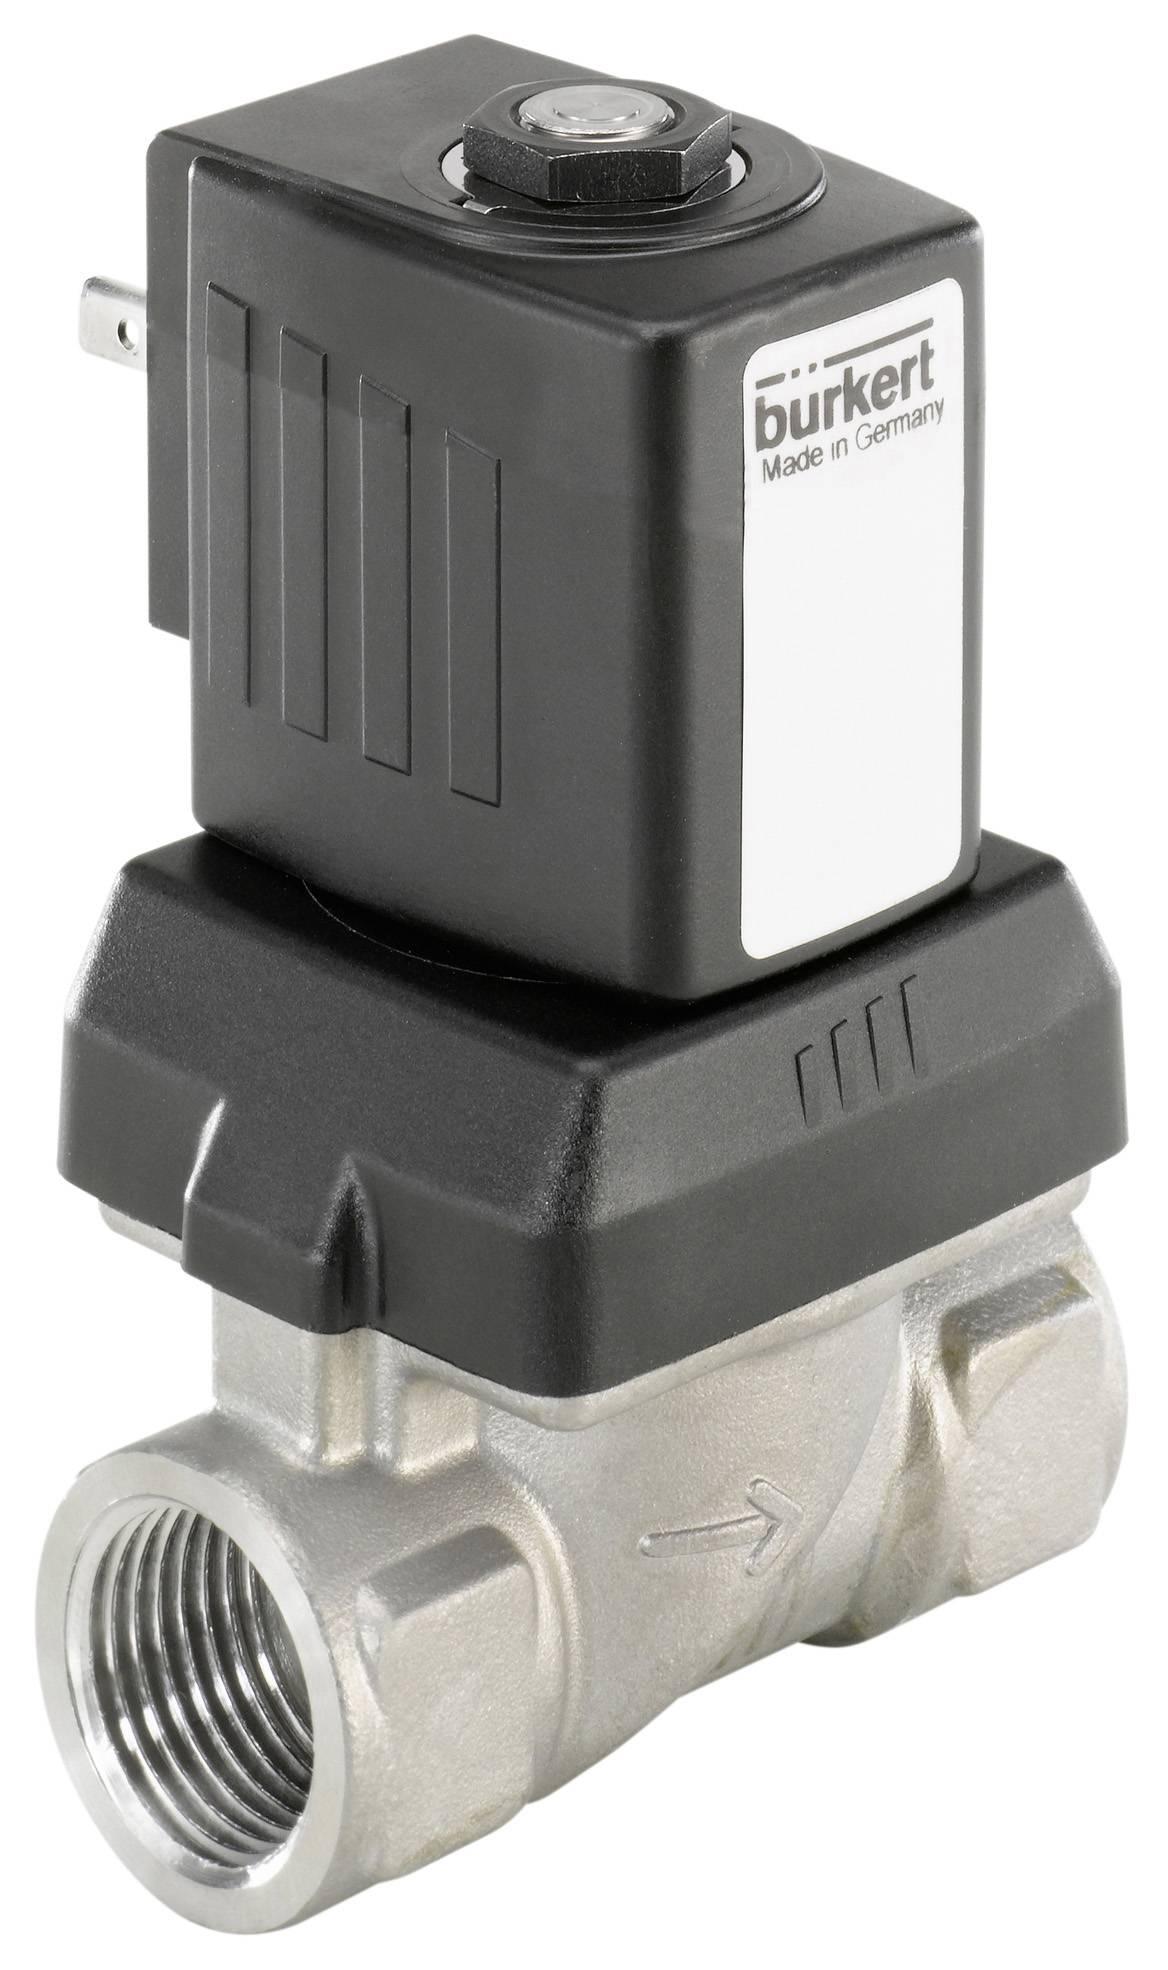 Vanne /à servocommande B/ürkert 221609 230 V//AC manchon G 1//2 1 pc s